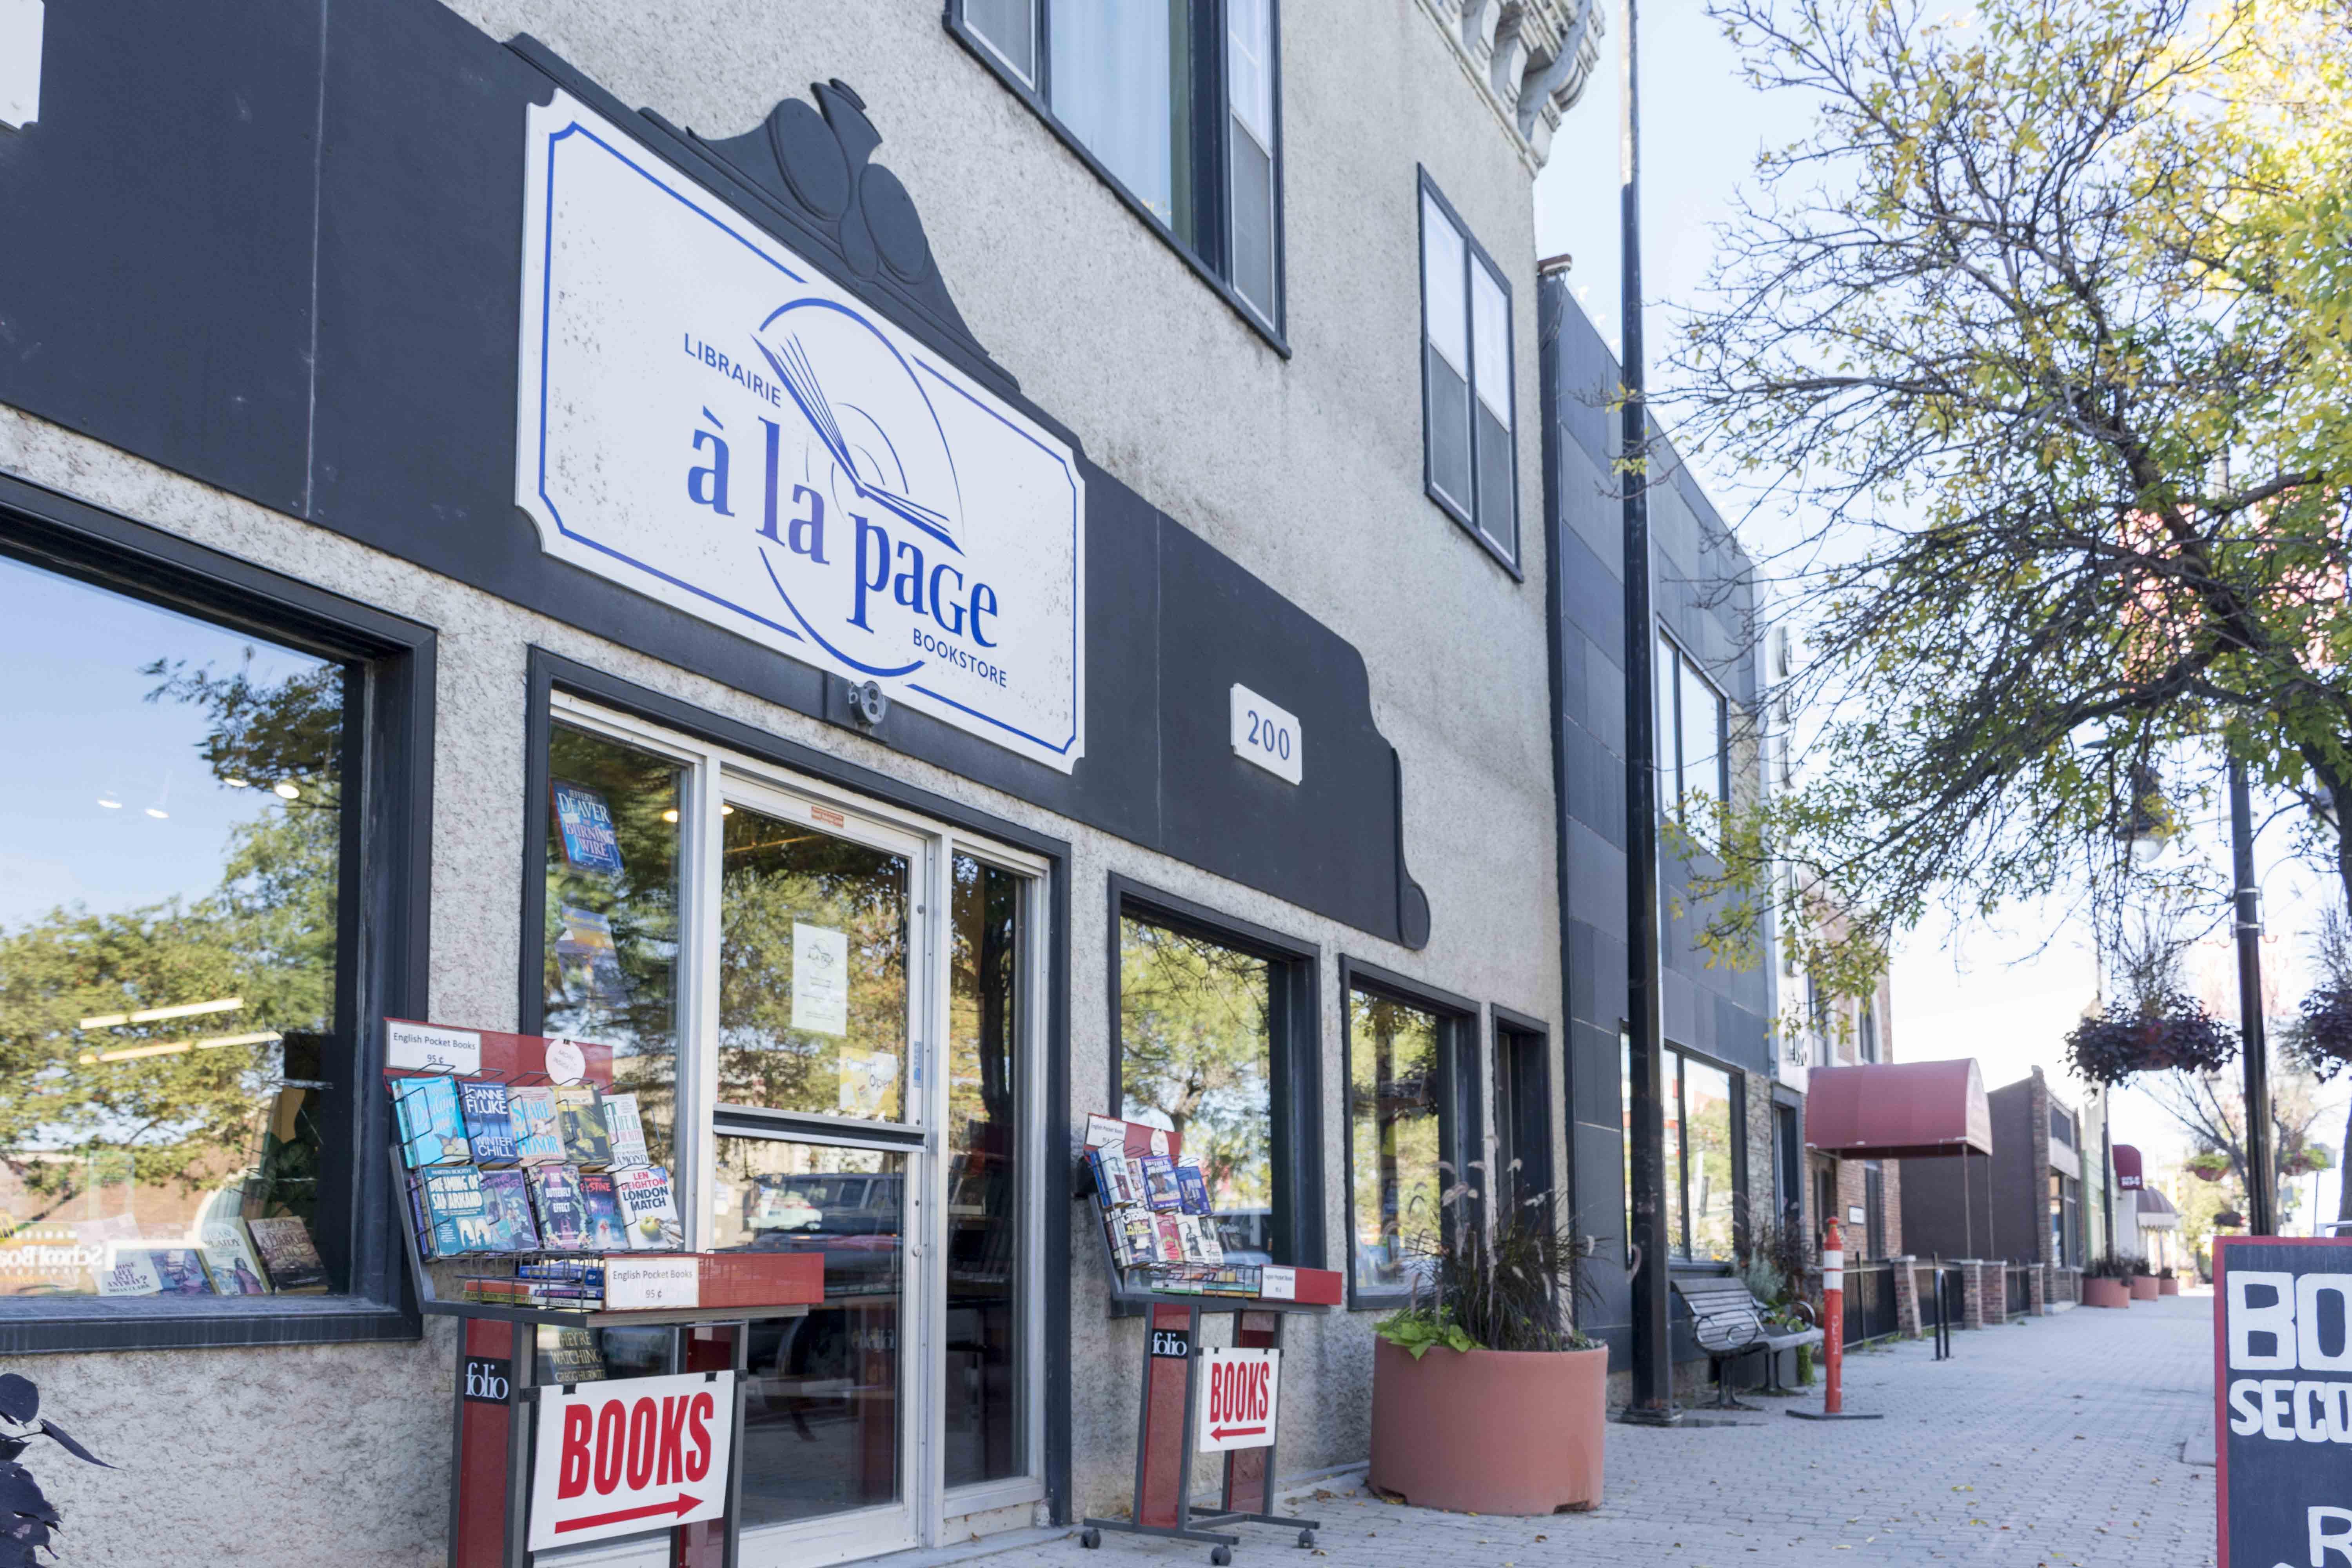 Book Store Winnipeg St. Boniface Foto: Flora Jädicke